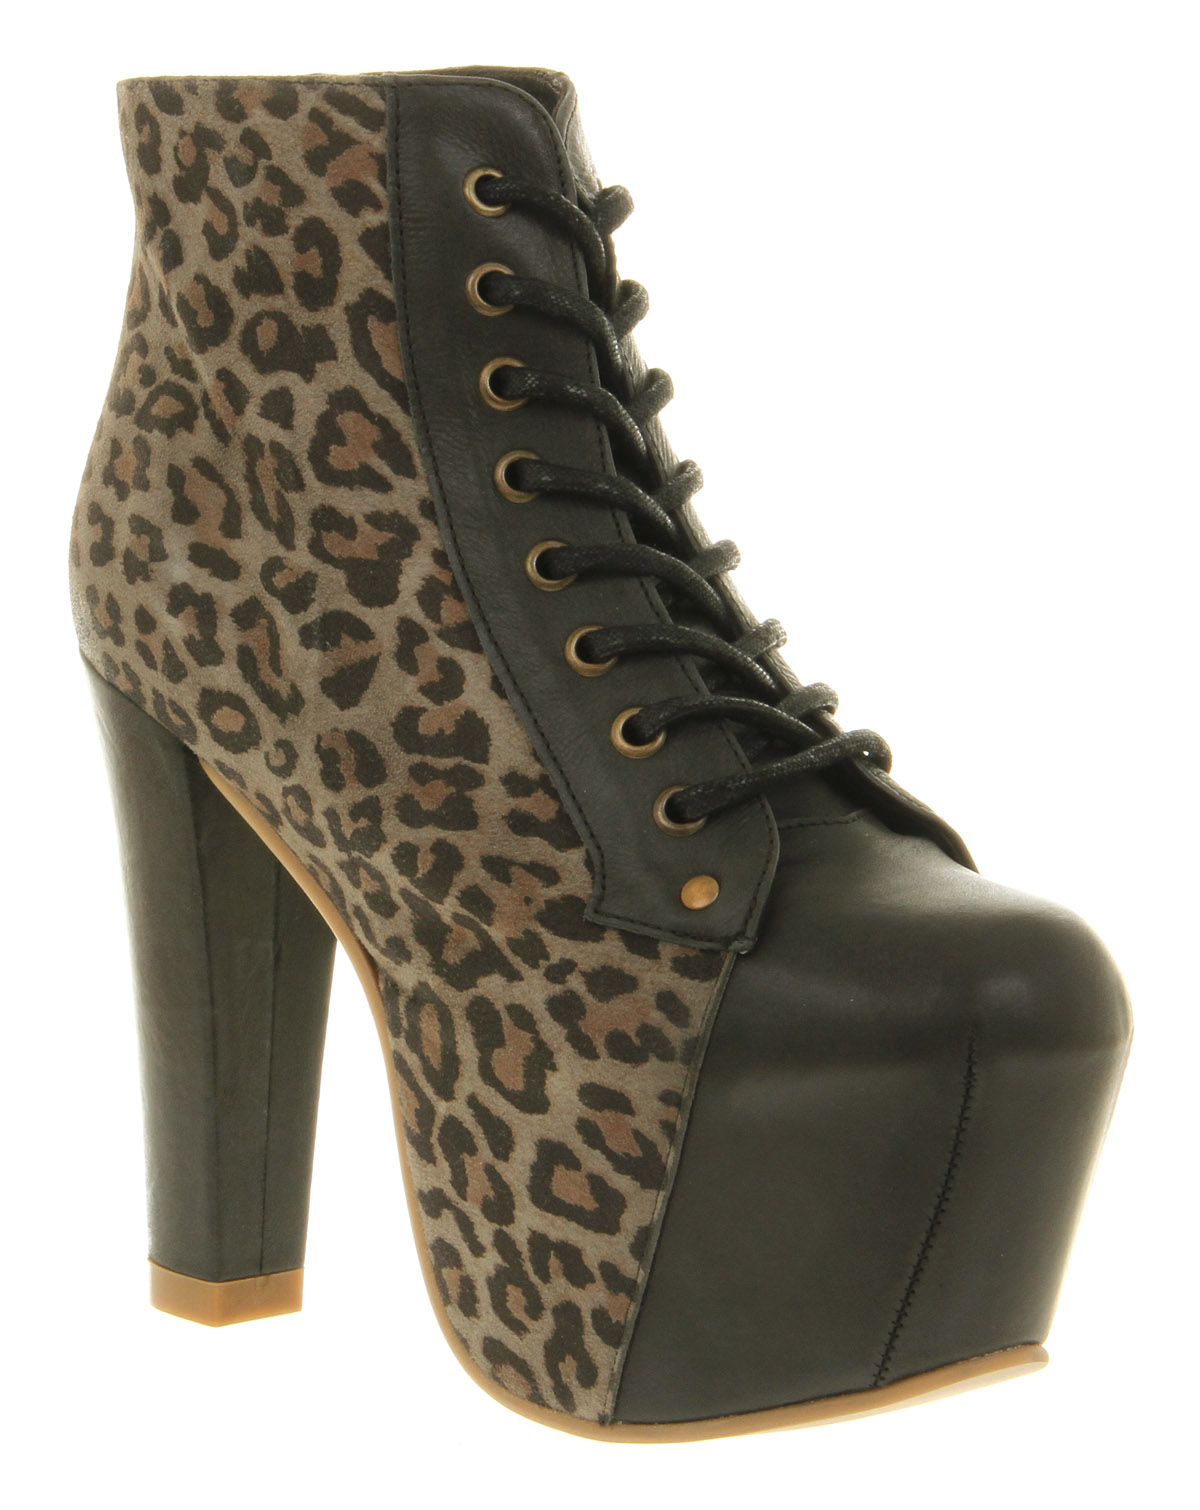 Womens-Jeffrey-Campbell-Lita-Platform-Ankle-Boot-Ante-gris-black-Boots